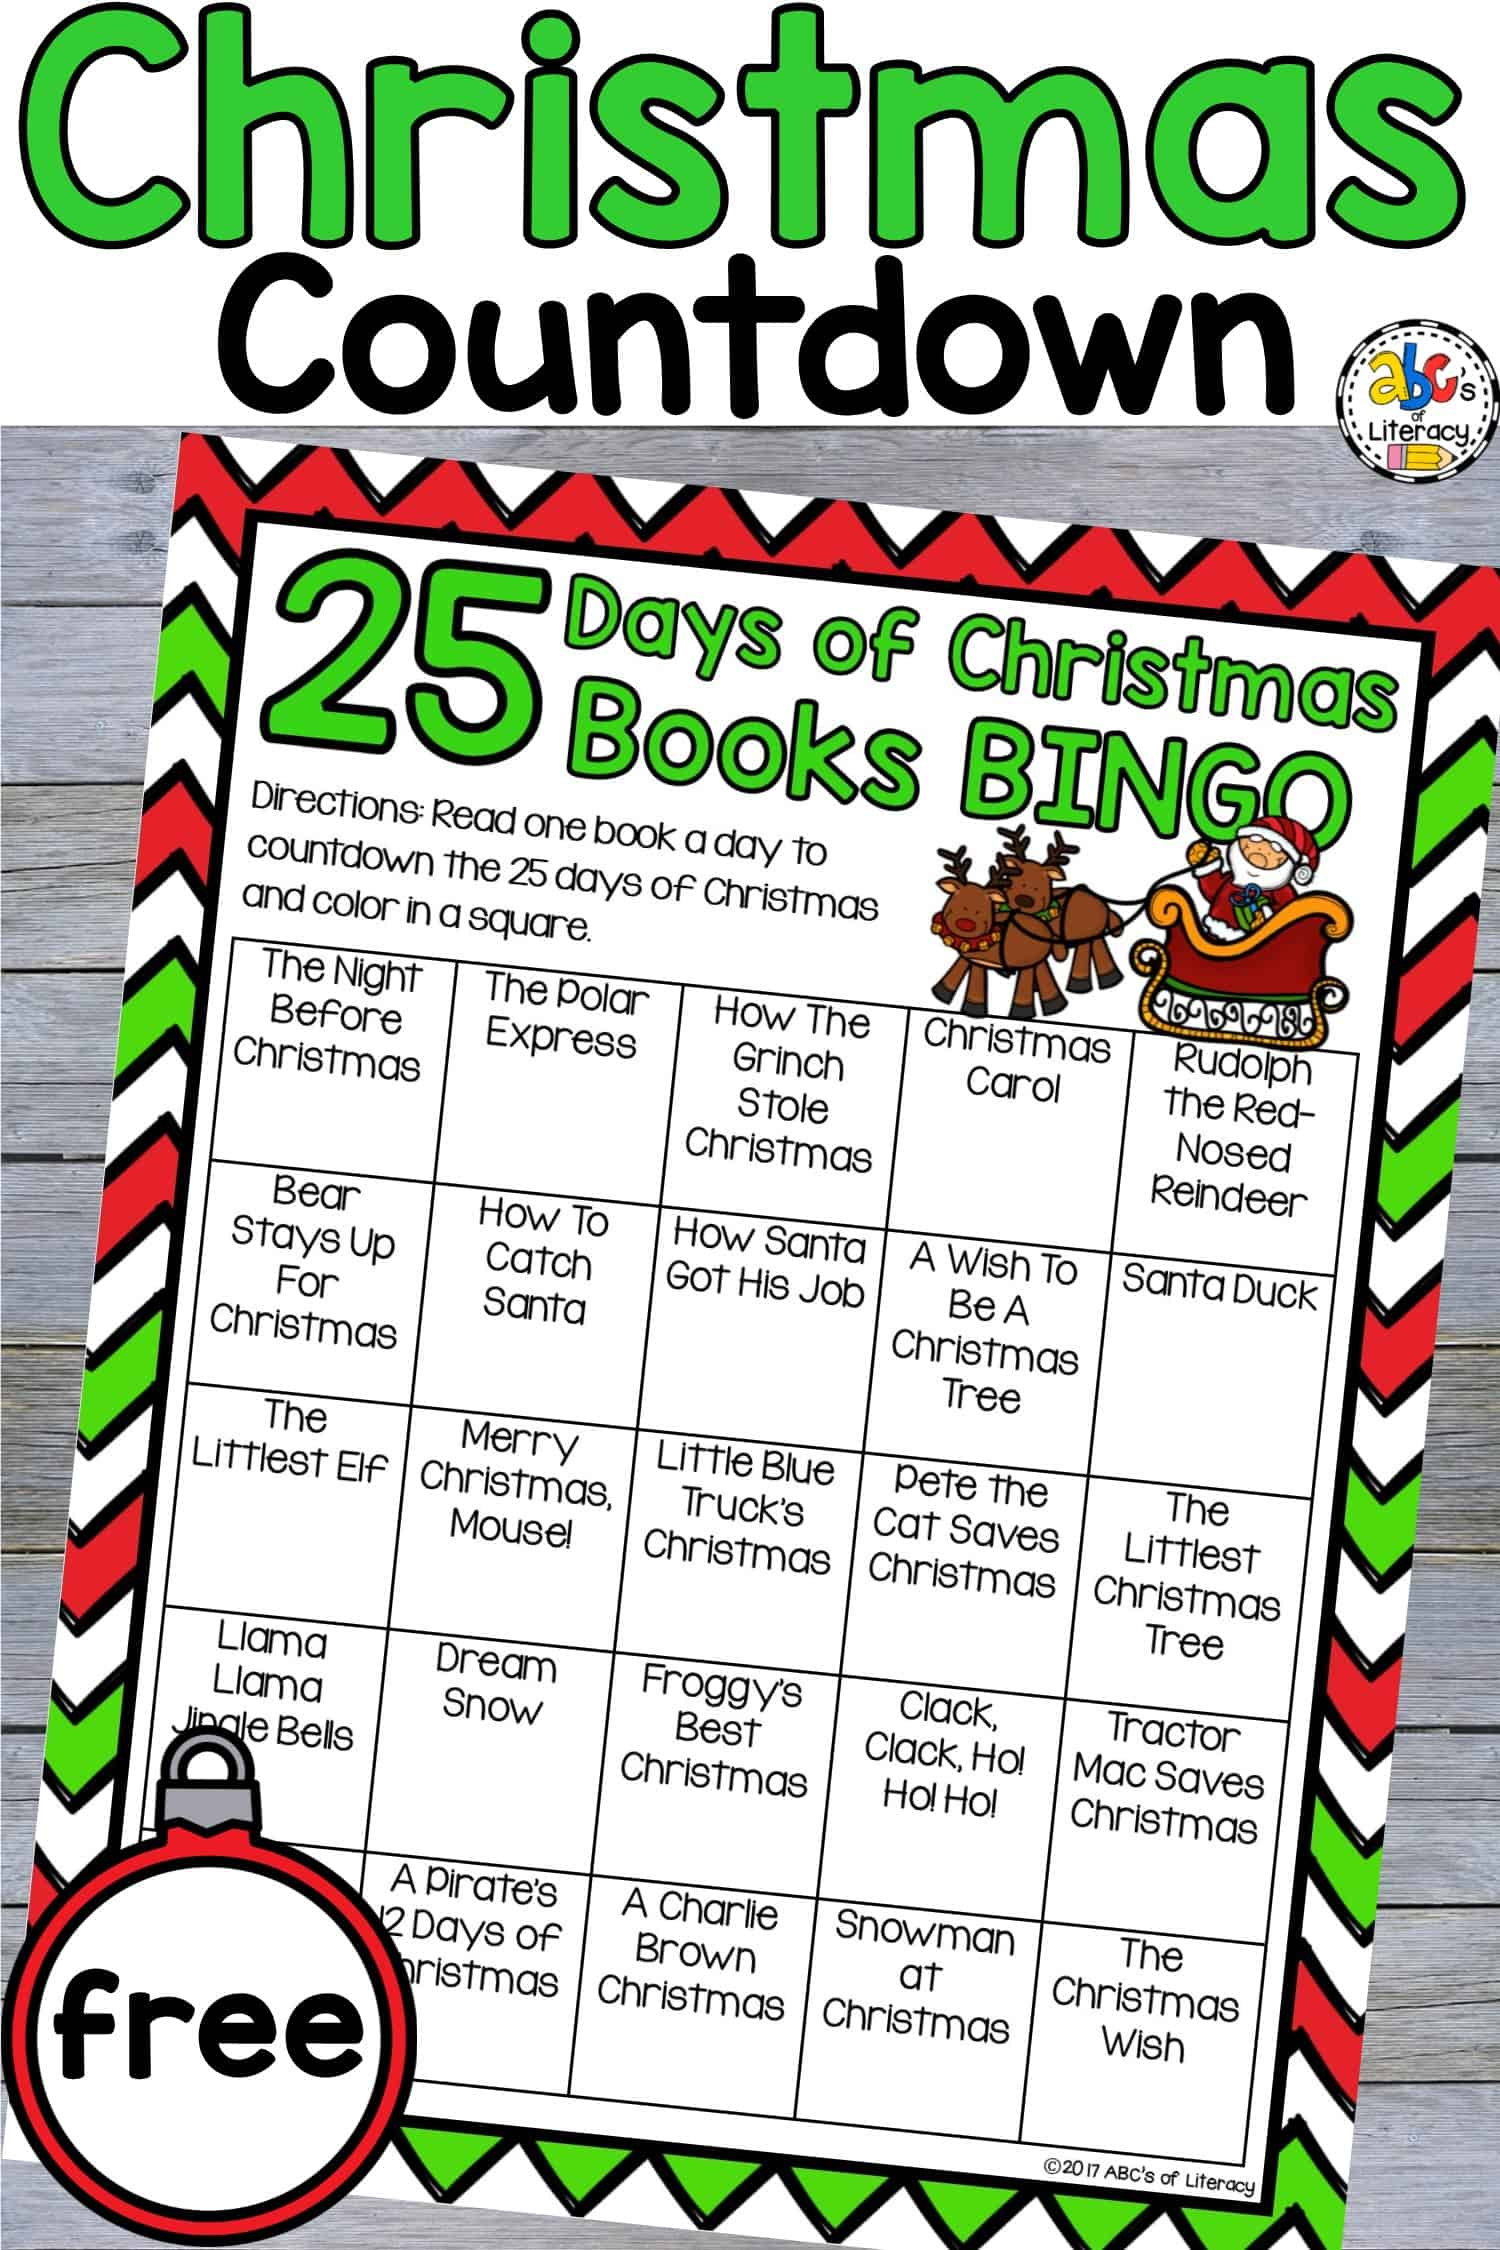 Christmas Books Bingo, Christmas Bingo, Christmas Activity for Kids, Countdown to Christmas, Countdown to Christmas Books Bingo, 25 Days of Christmas Books Bingo